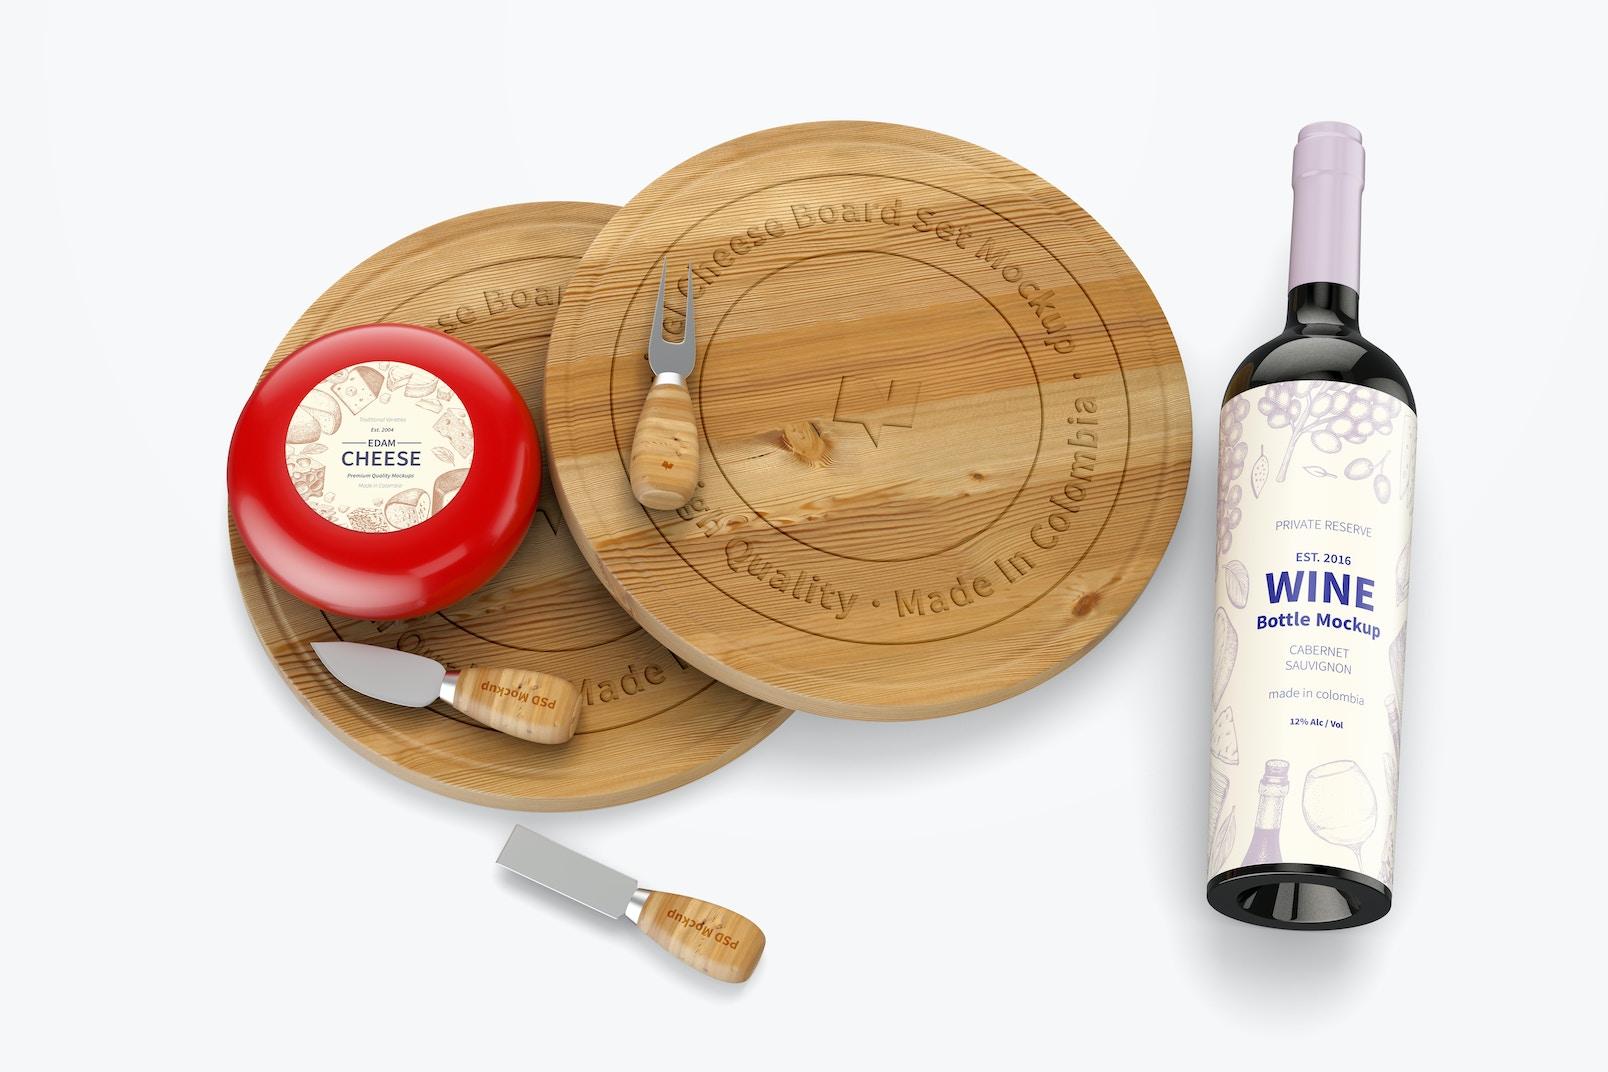 Swivel Cheese Board Set with Wine Bottle Mockup